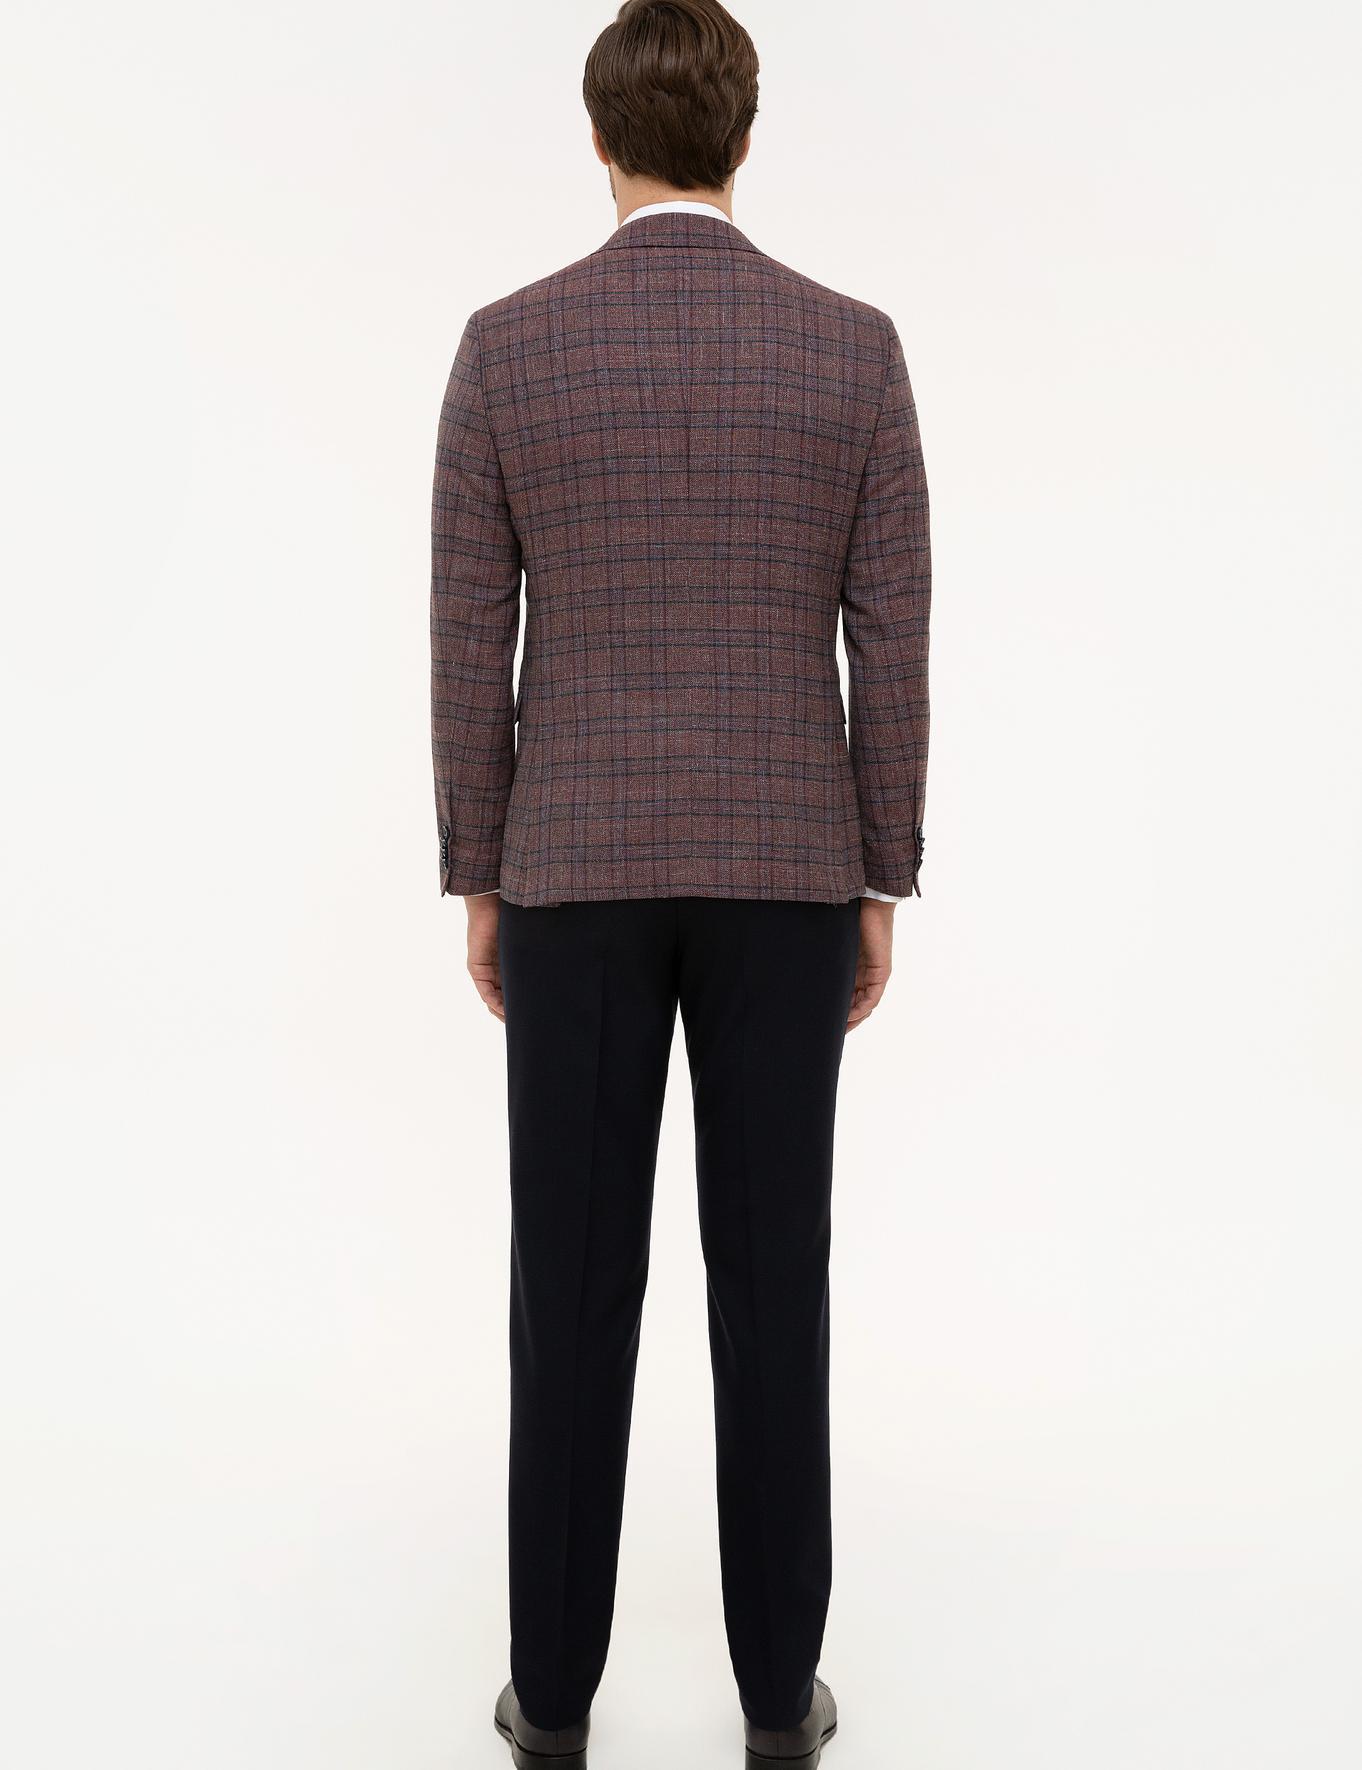 Bordo Slim Fit Takım Elbise - 50223910009